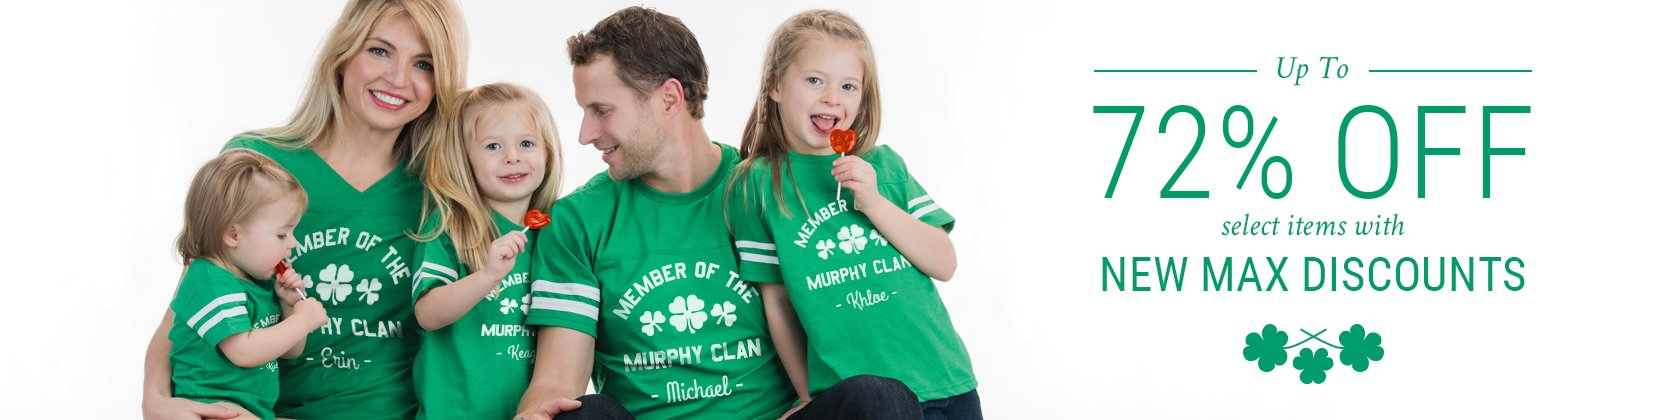 7d3bdd47e Custom St. Patricks Day Shirts, Tank Tops, Undies, & More